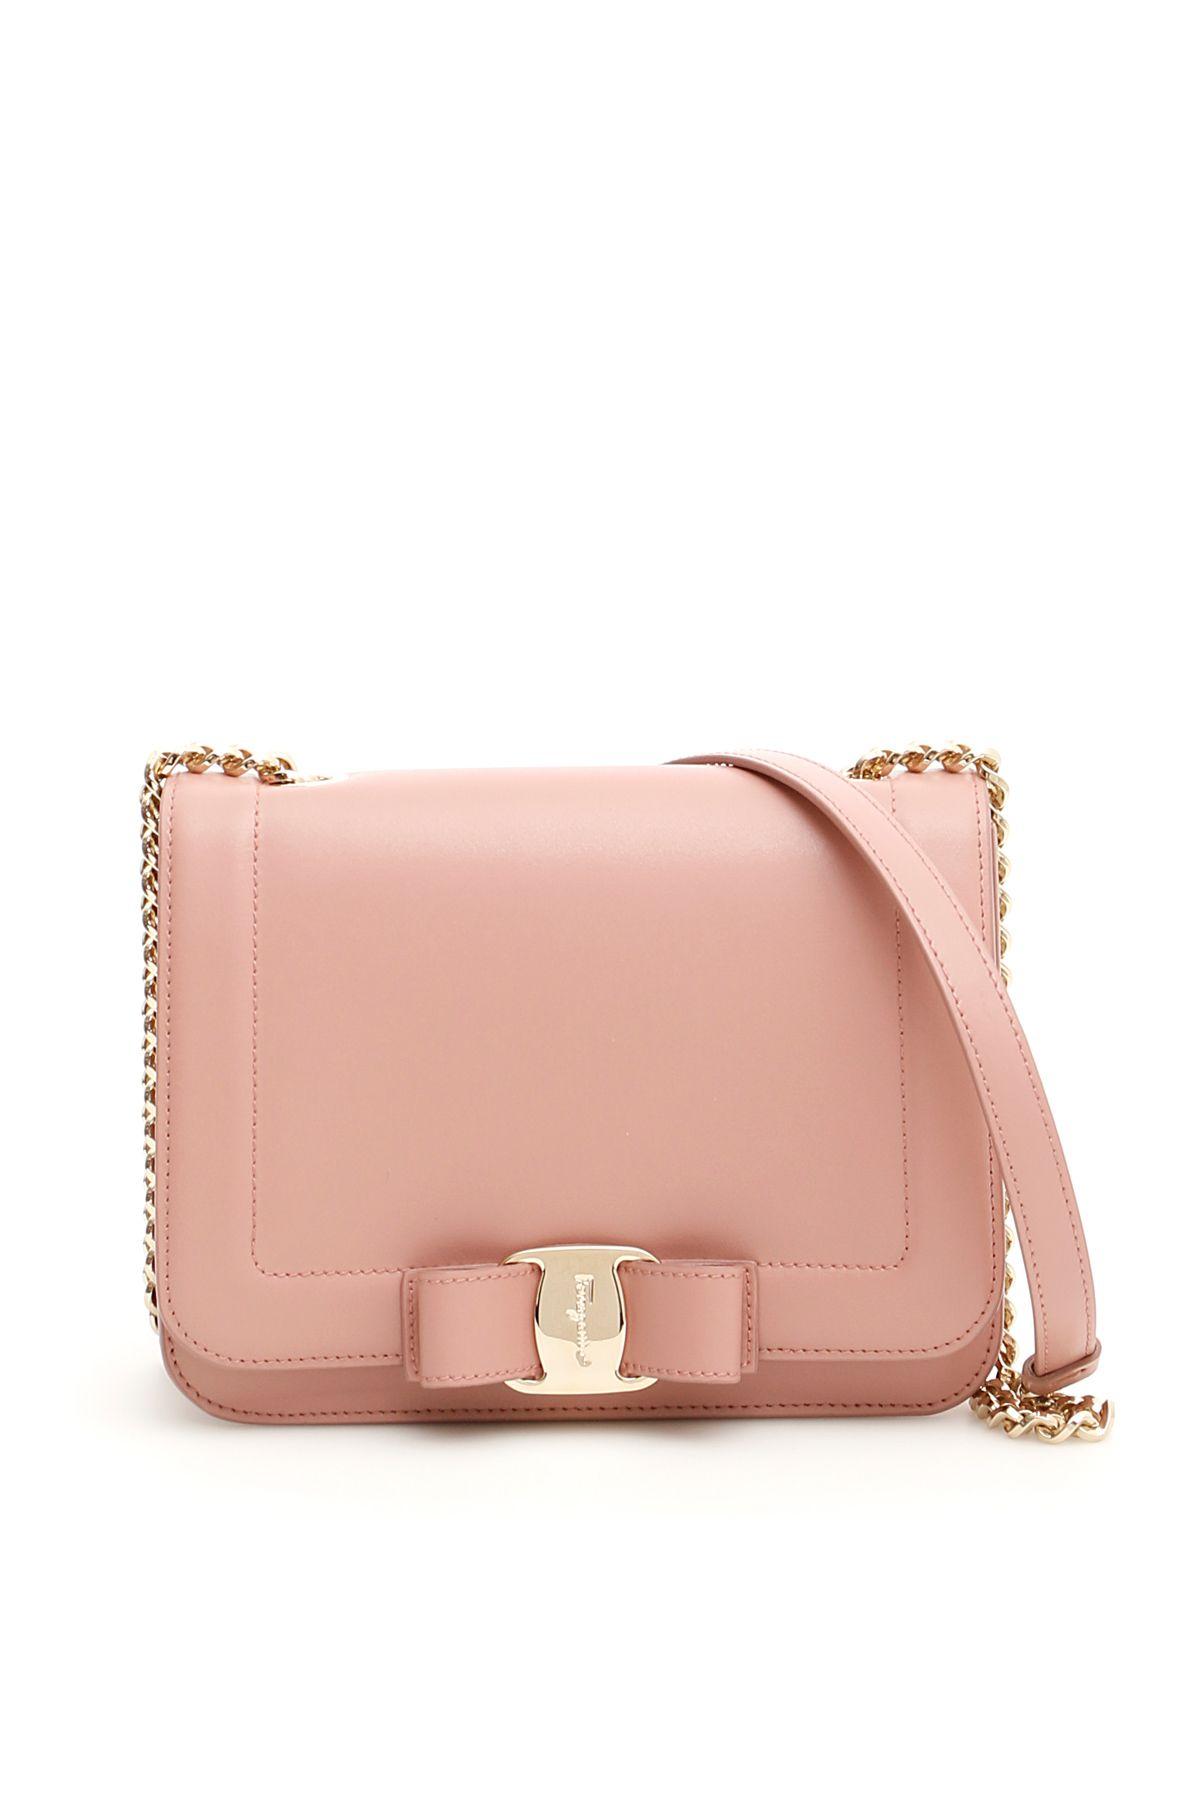 Salvatore Ferragamo Leather Vara Rainbow Bag In Pink 532f5b8df7ba7